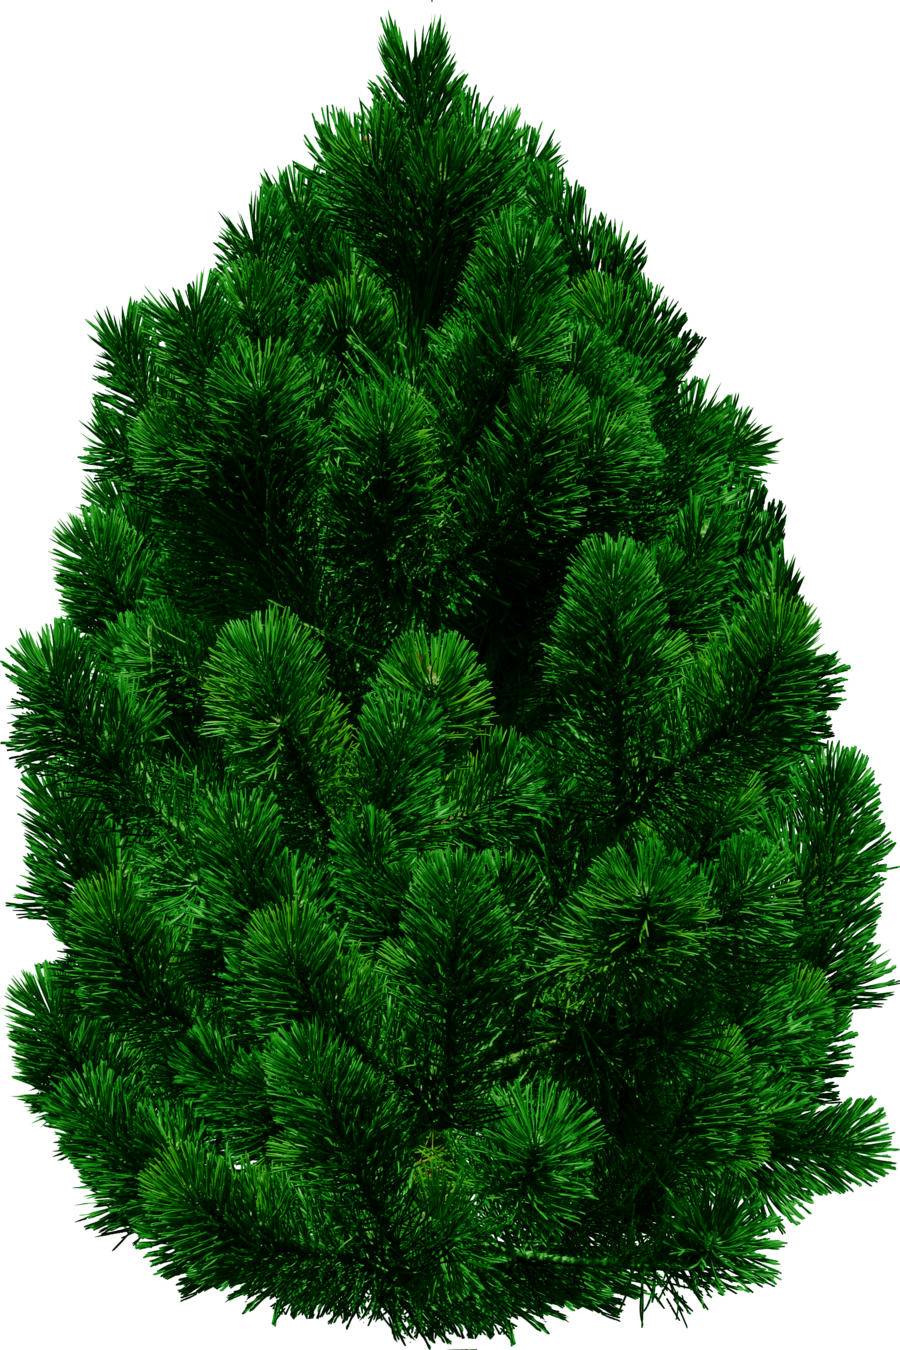 Fir Tree Large PNG Image